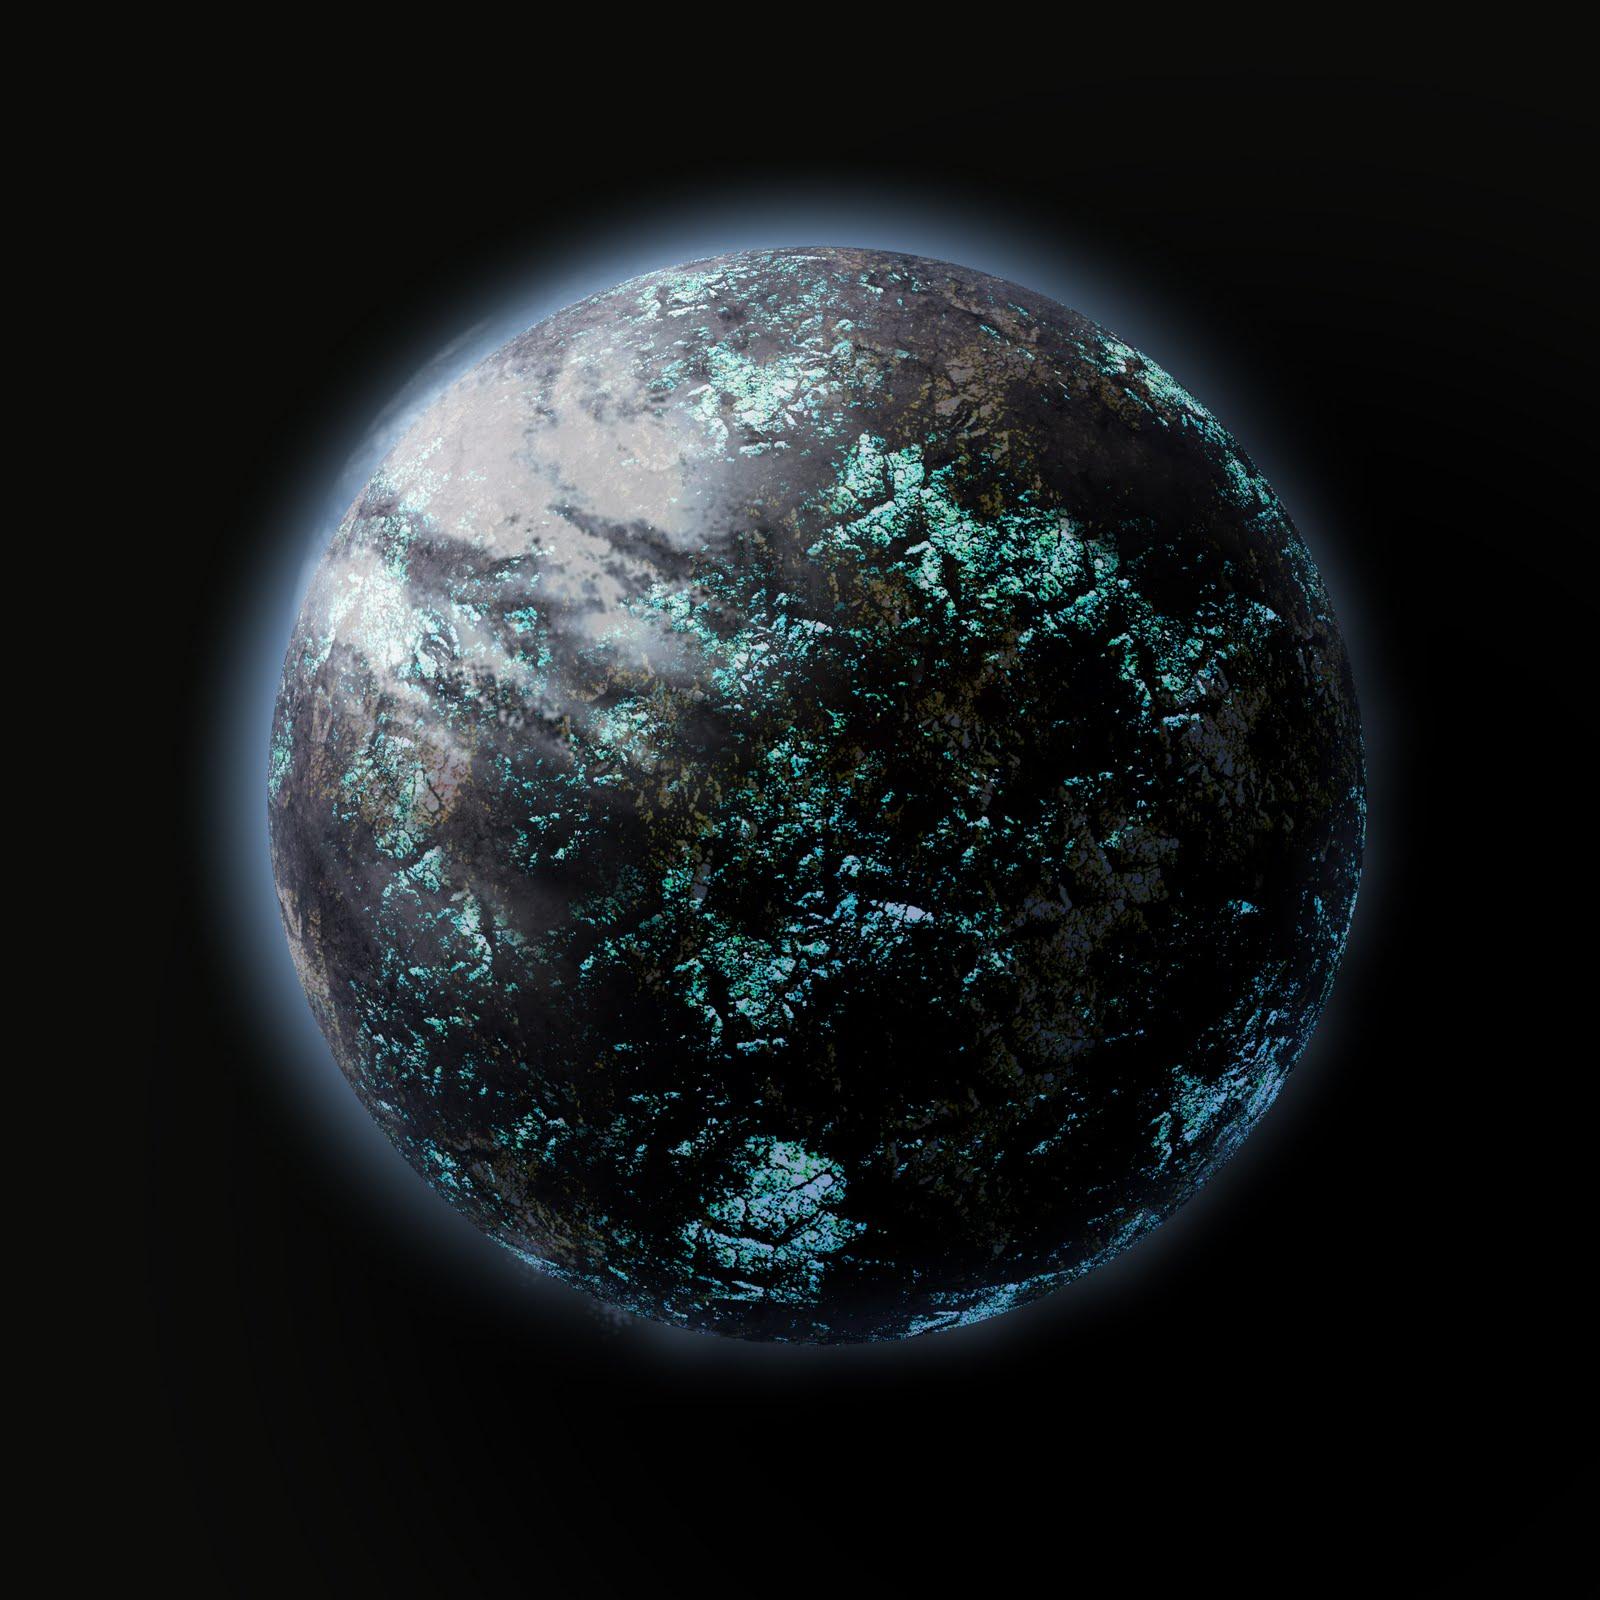 http://4.bp.blogspot.com/_t3CsQGWP8IE/TCRbolK36EI/AAAAAAAAAH8/XrpRuwKwJa4/s1600/Planet+02.jpg